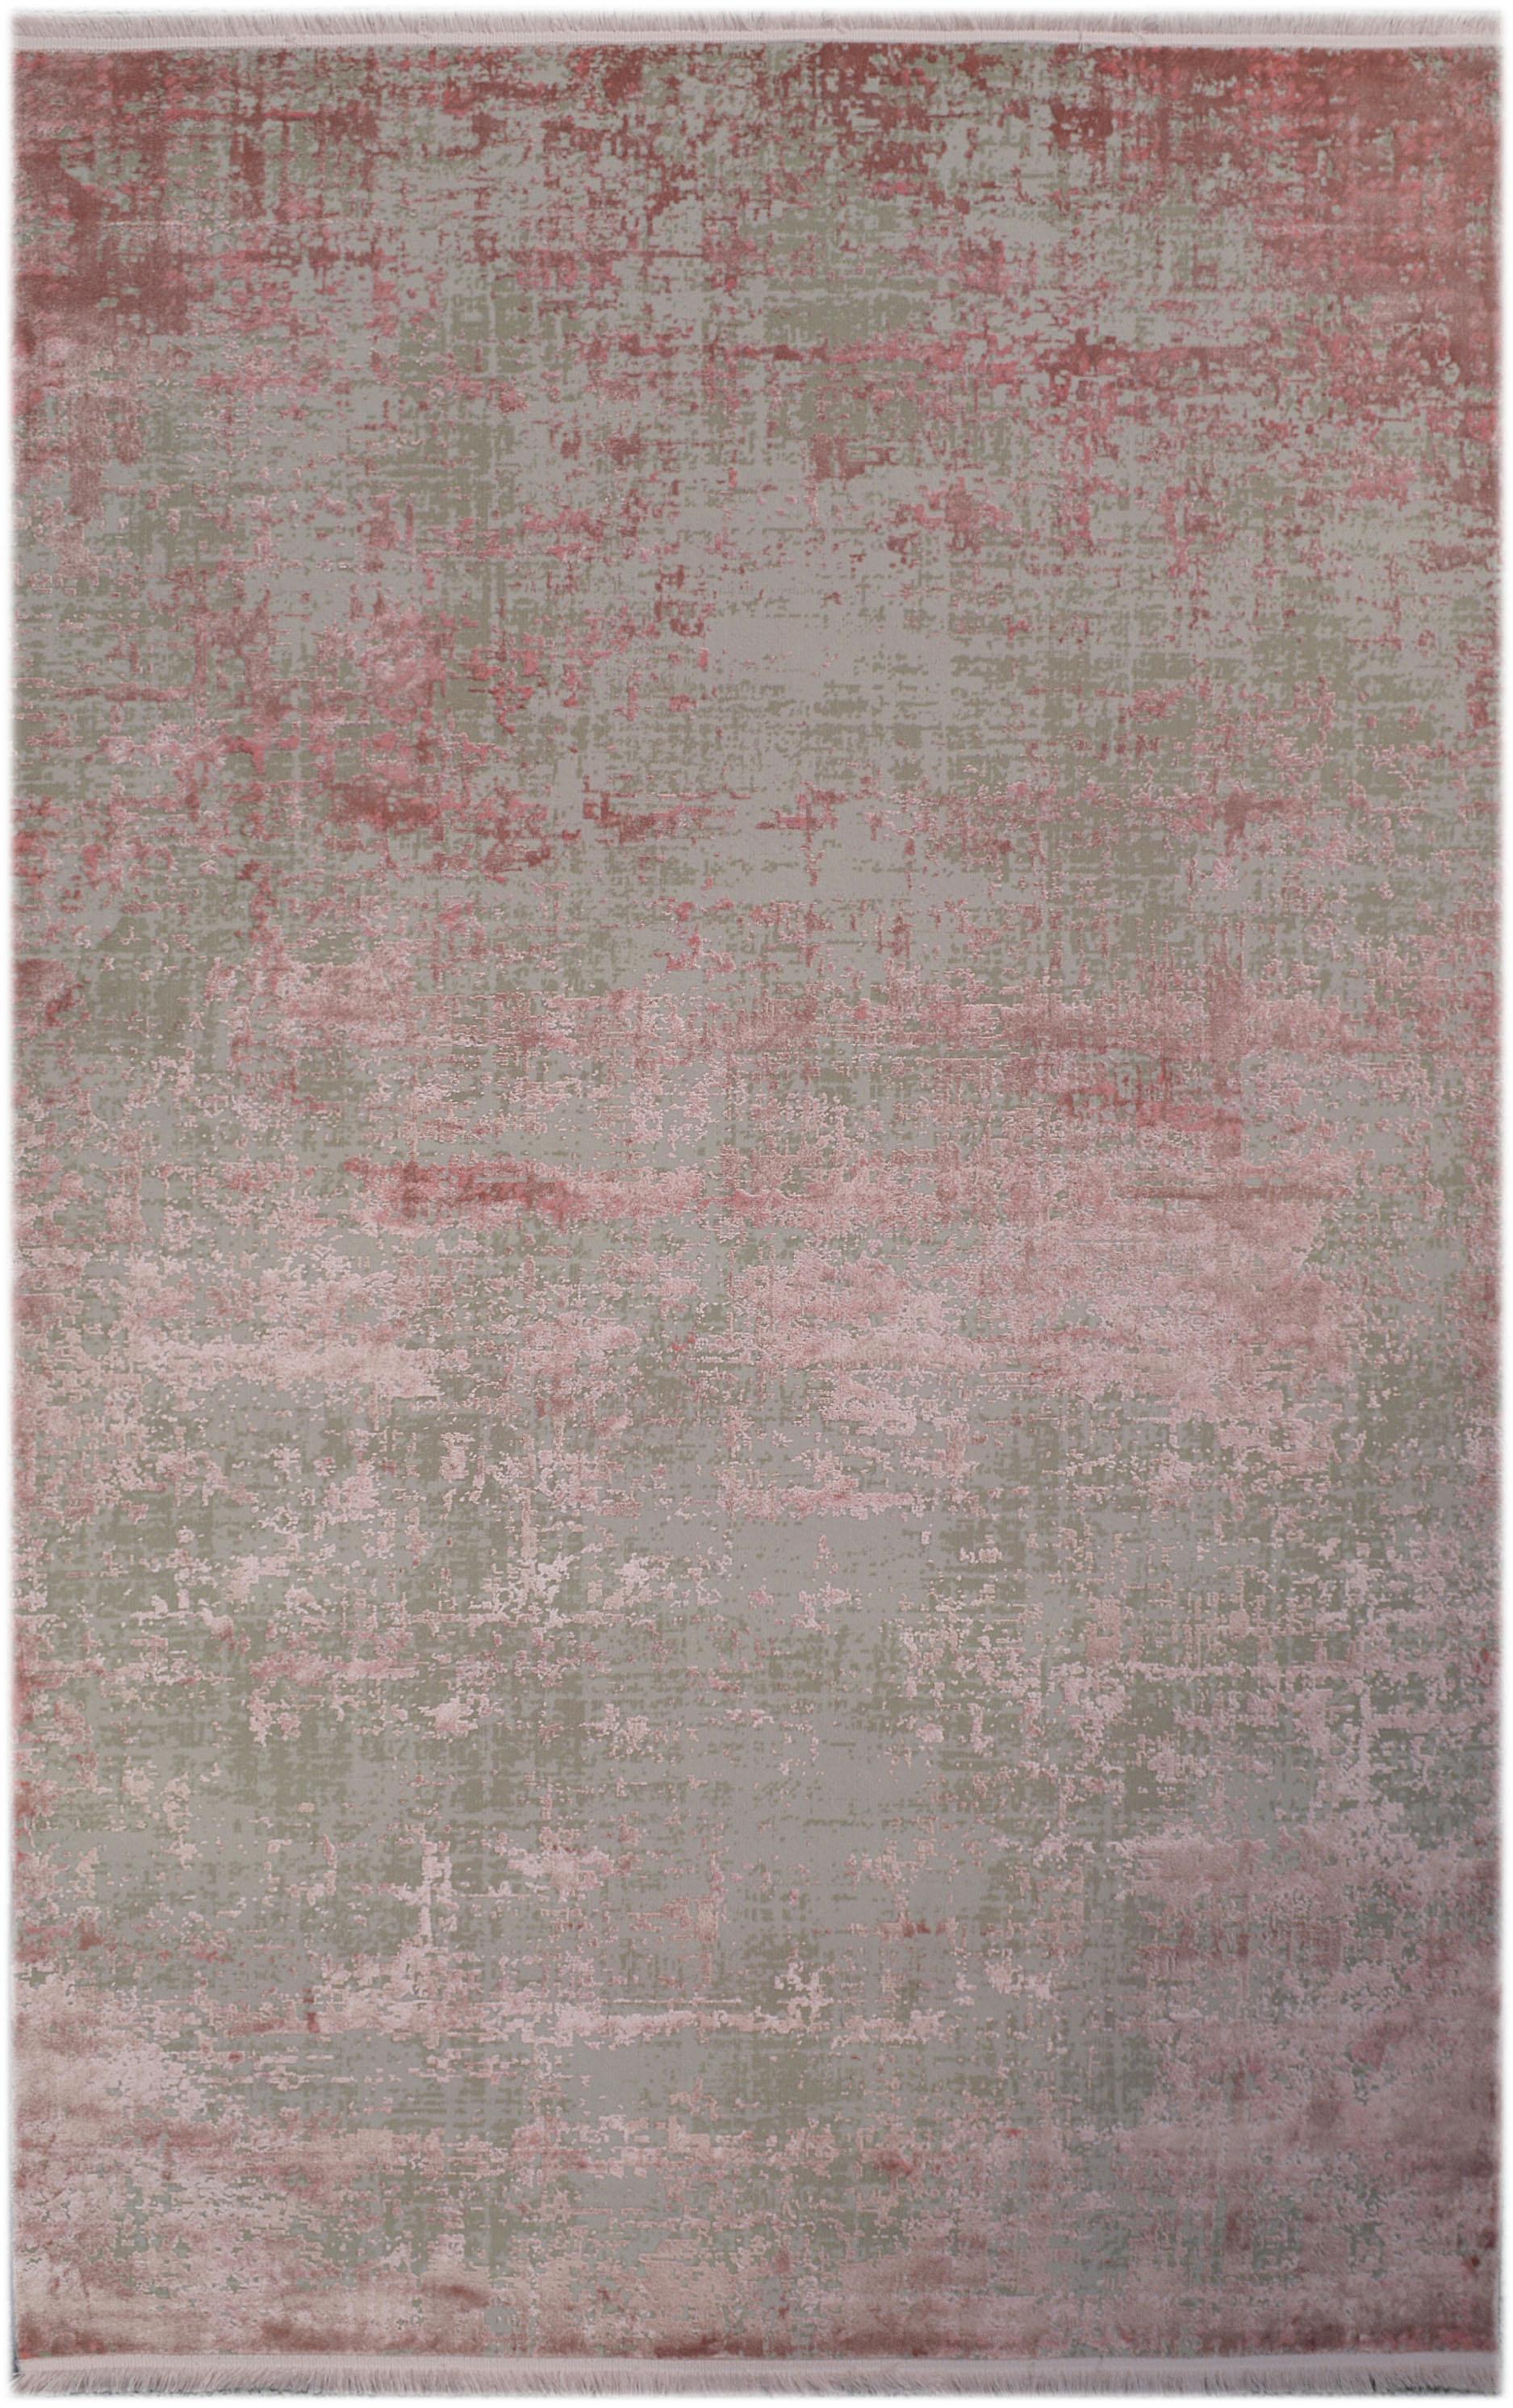 Schimmernder Teppich Cordoba mit Fransen, Vintage Style, Flor: 70% Acryl, 30% Viskose, Grau, Rosatöne, B 130 x L 190 cm (Größe S)